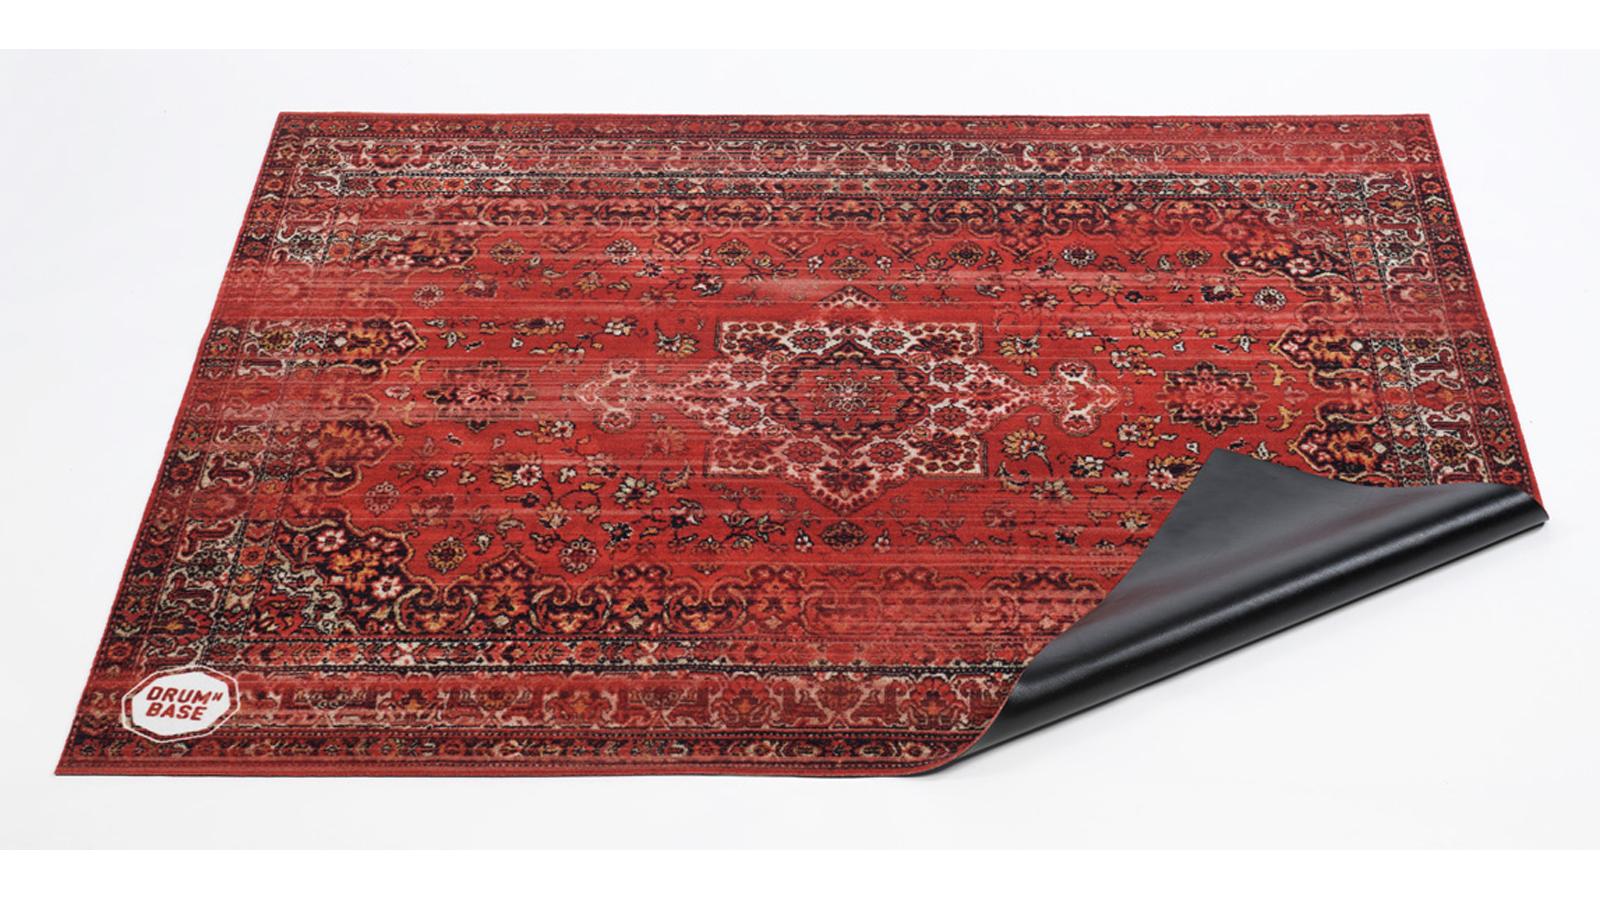 DRUM N BASE Vintage Persian Drumteppich RD rot